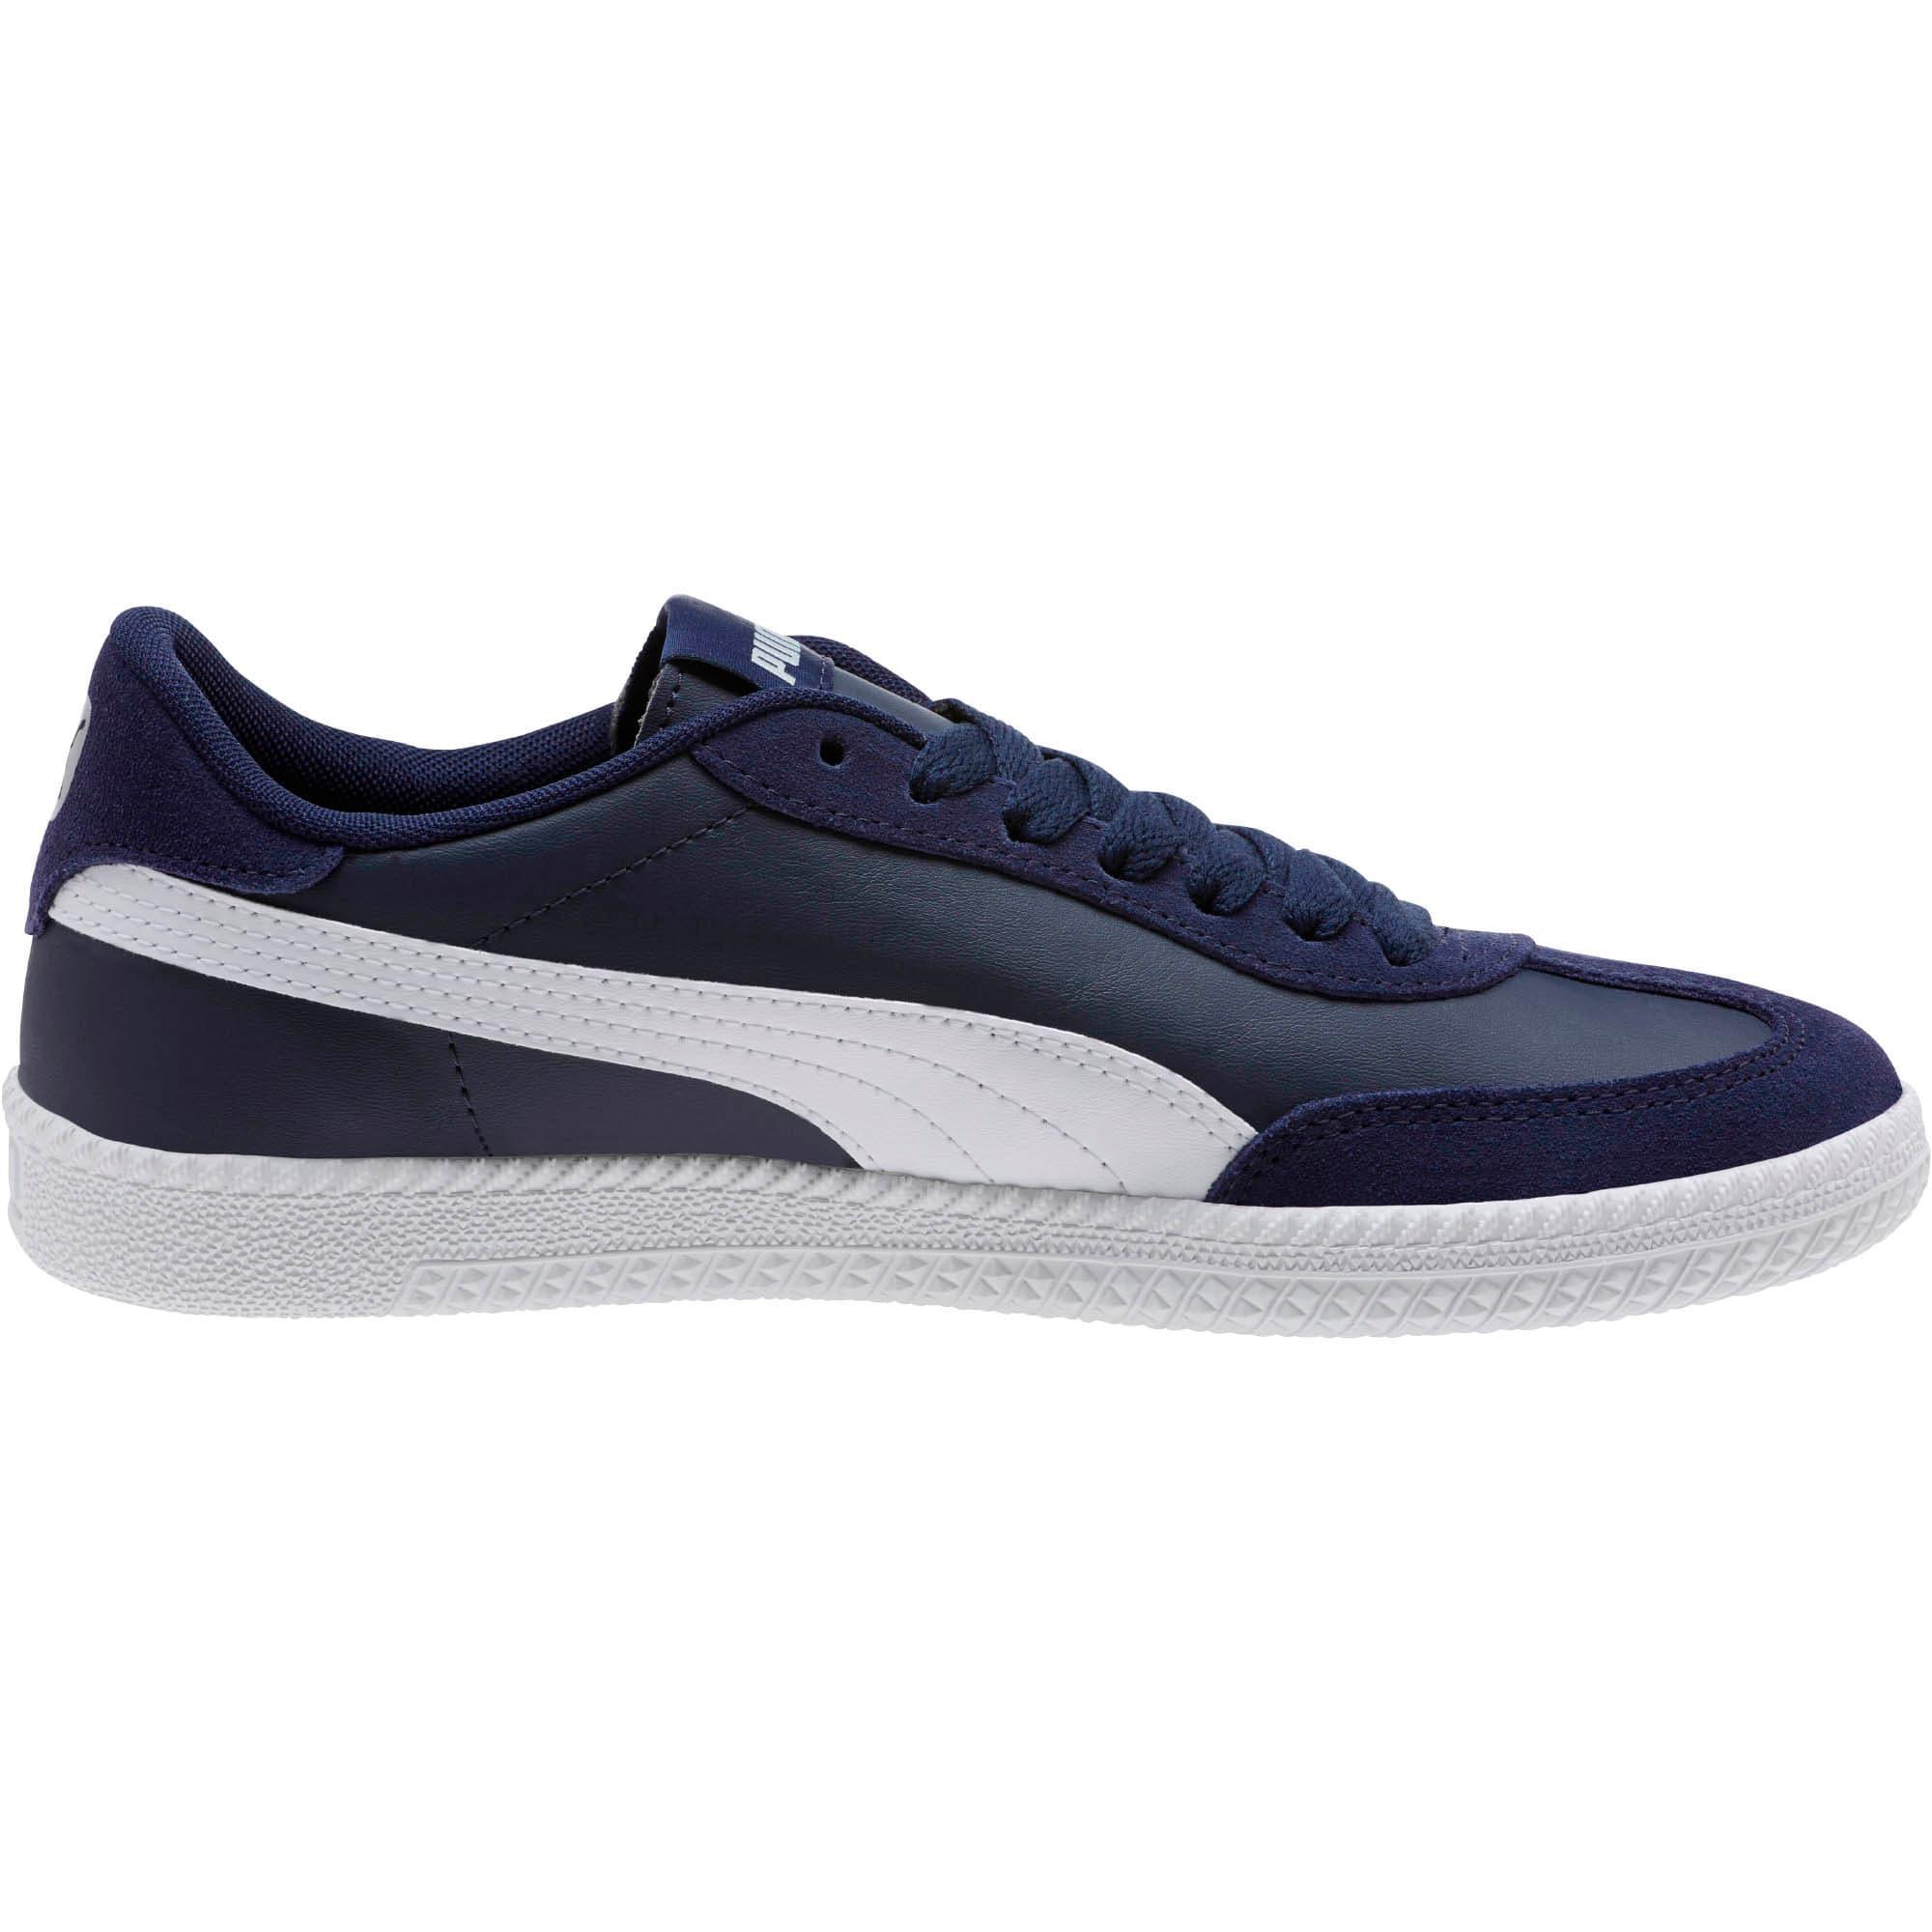 Thumbnail 3 of Astro Cup Sneakers, Peacoat-Puma White, medium